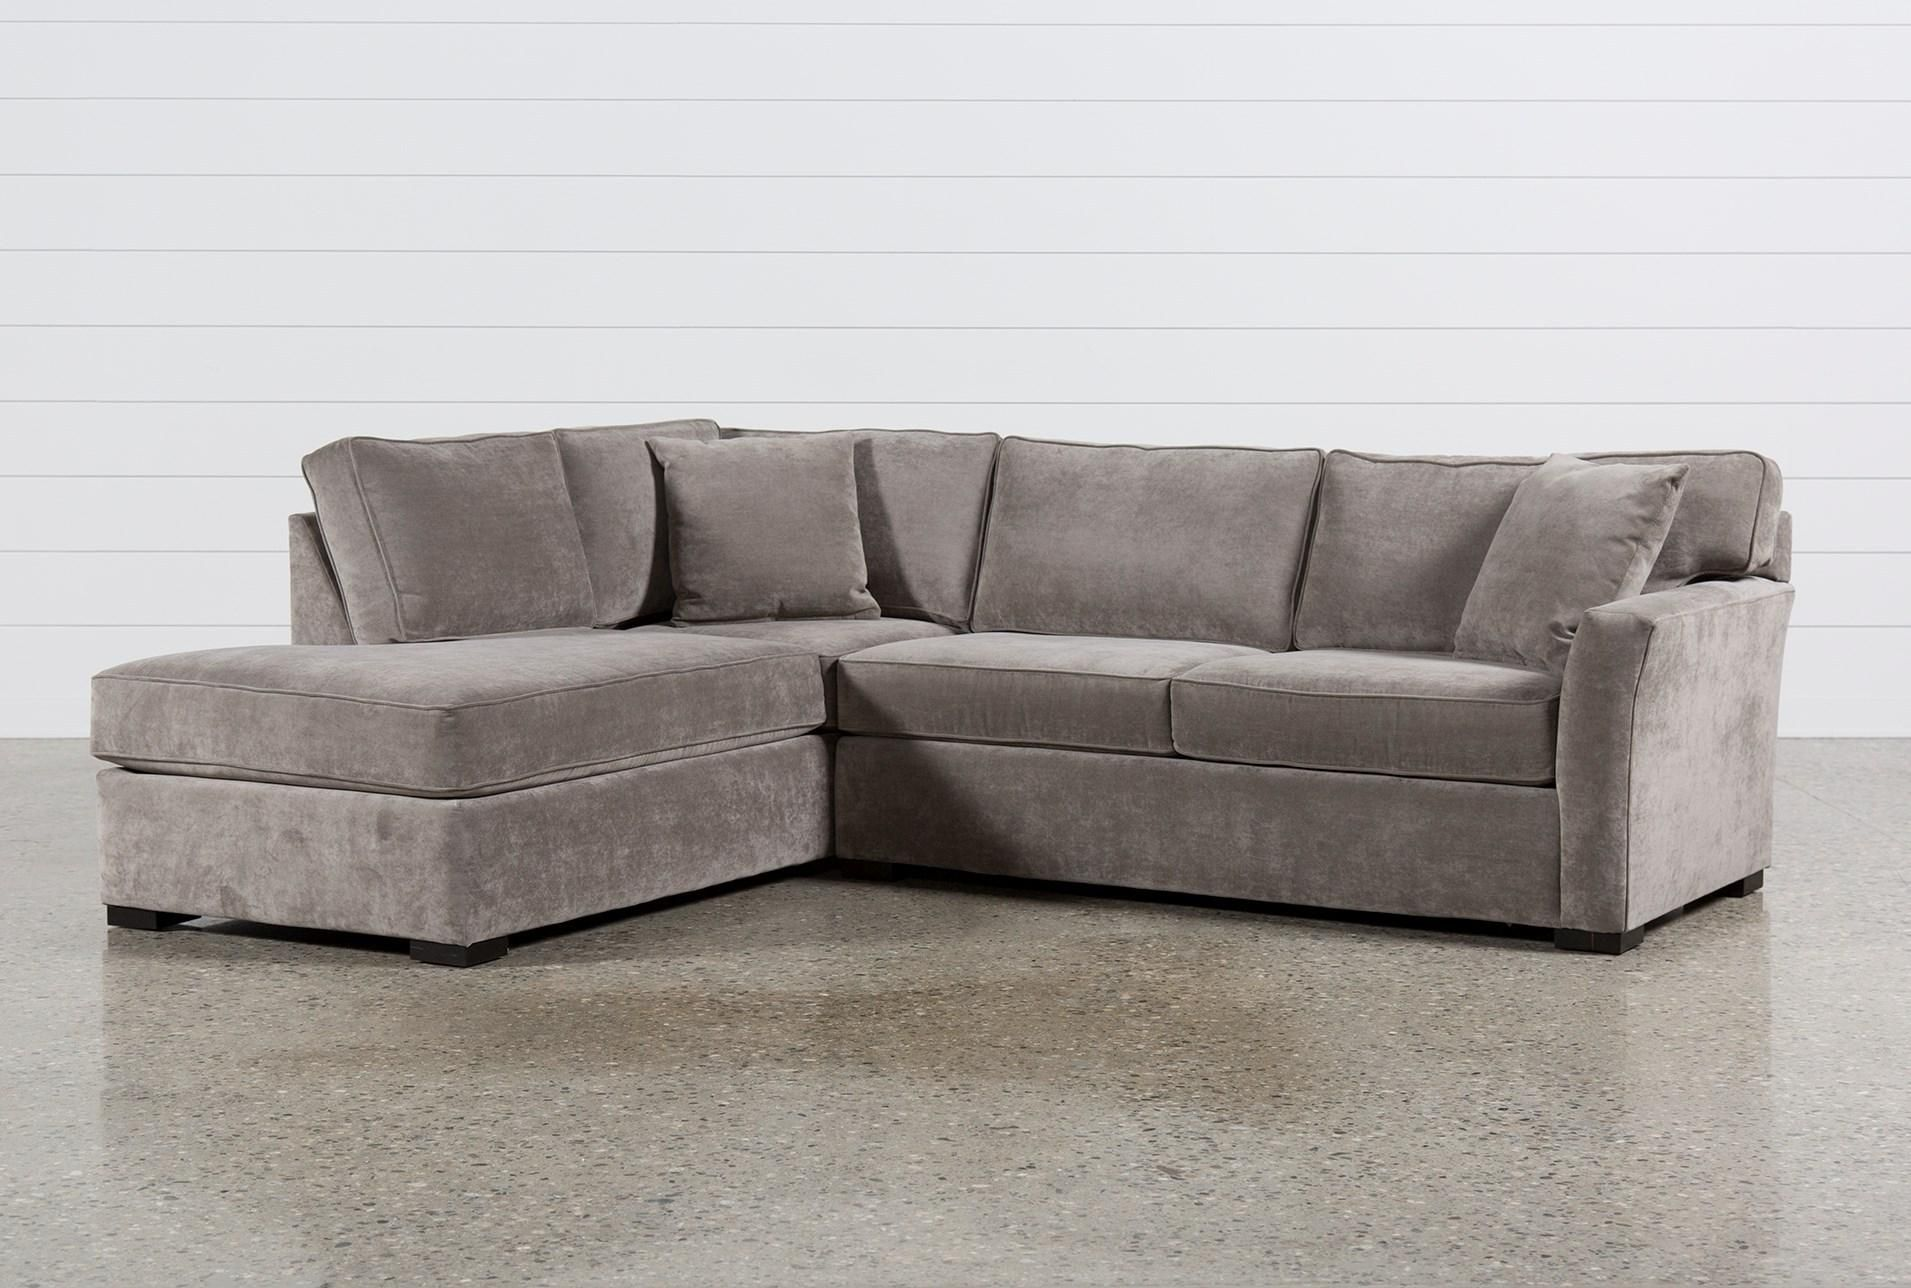 aspen 2 piece sleeper sectional w laf chaise new home sleeper rh pinterest co uk